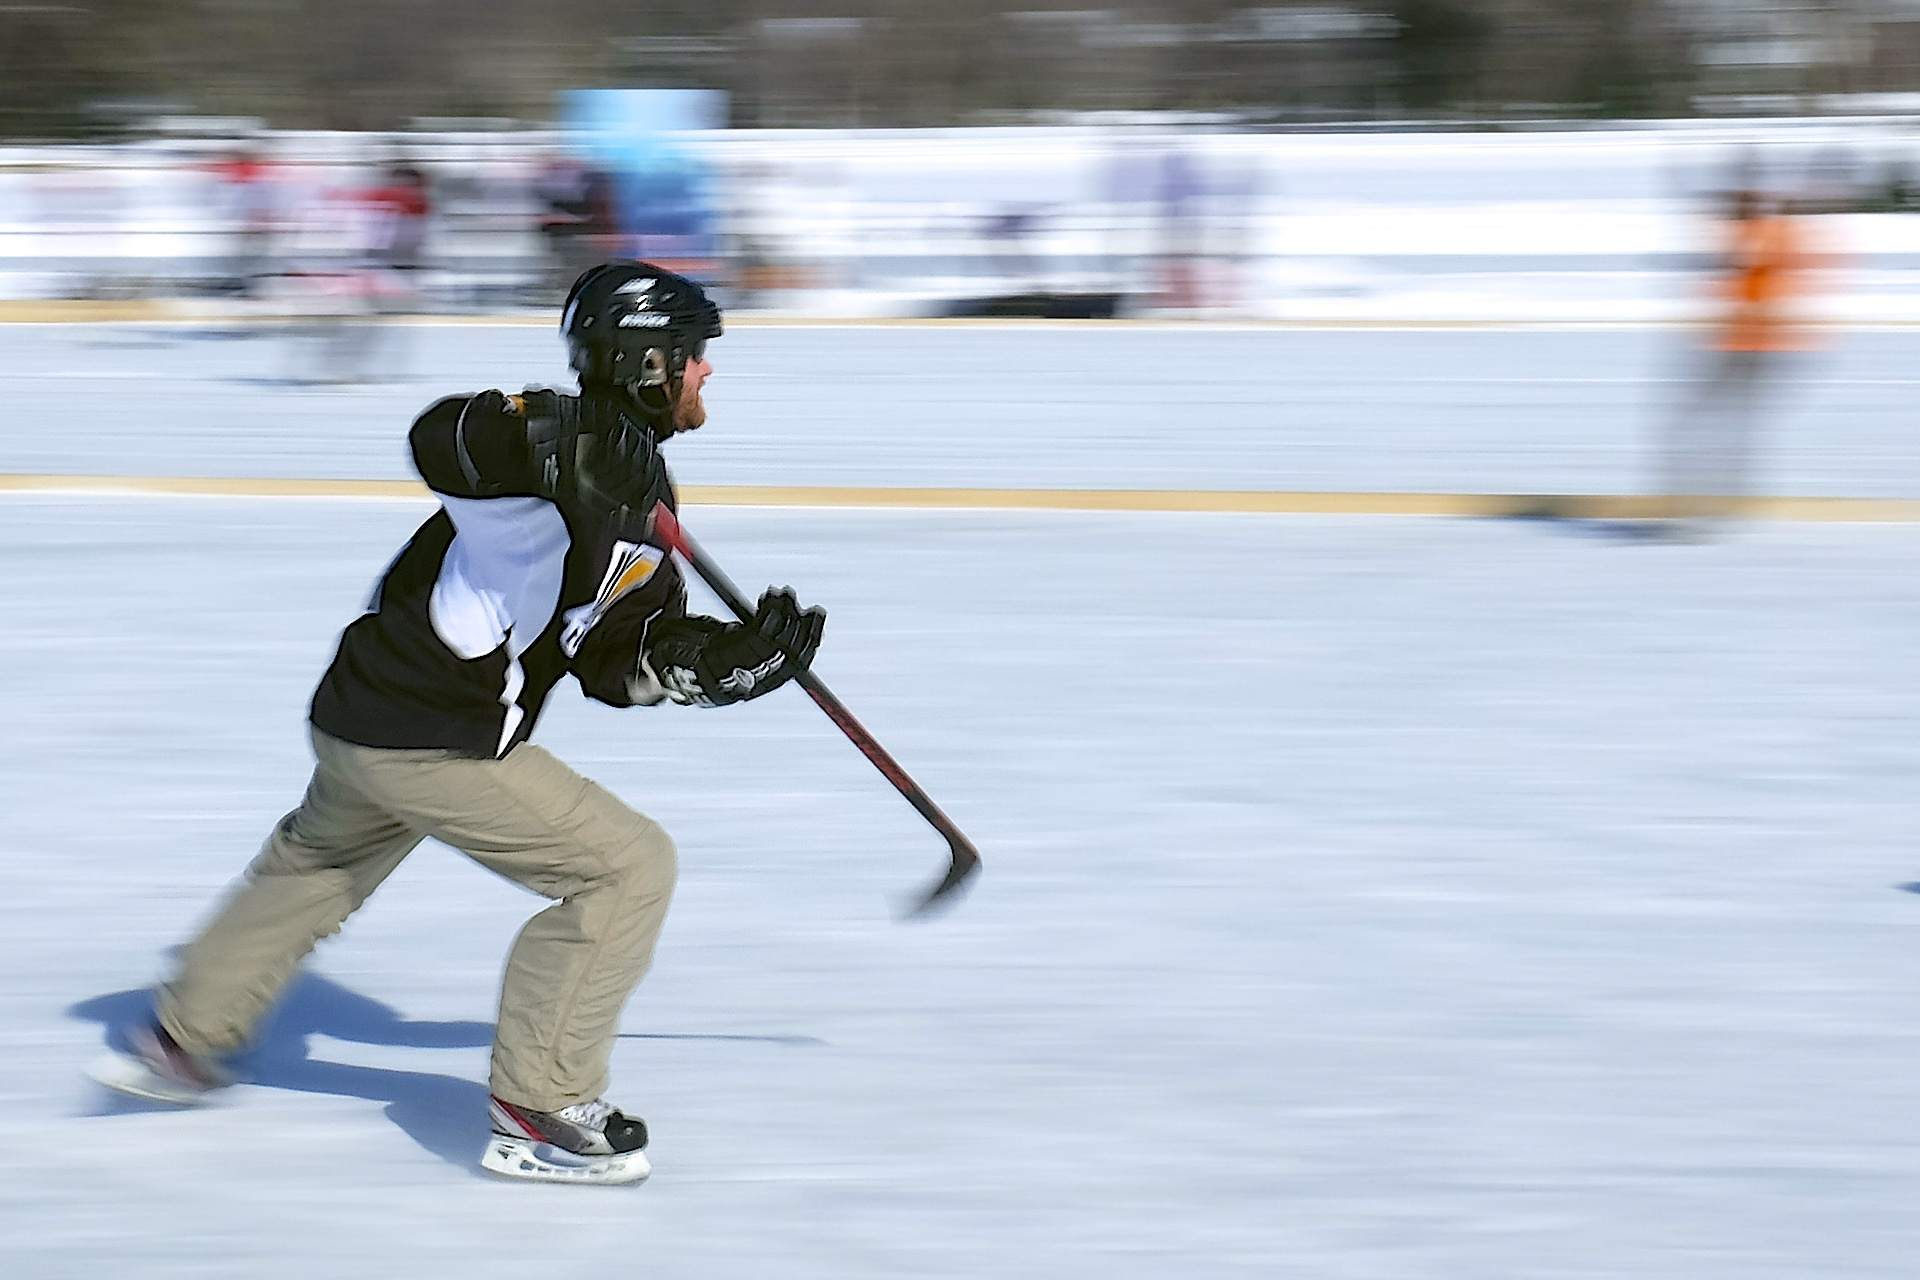 Canadian Pond Hockey